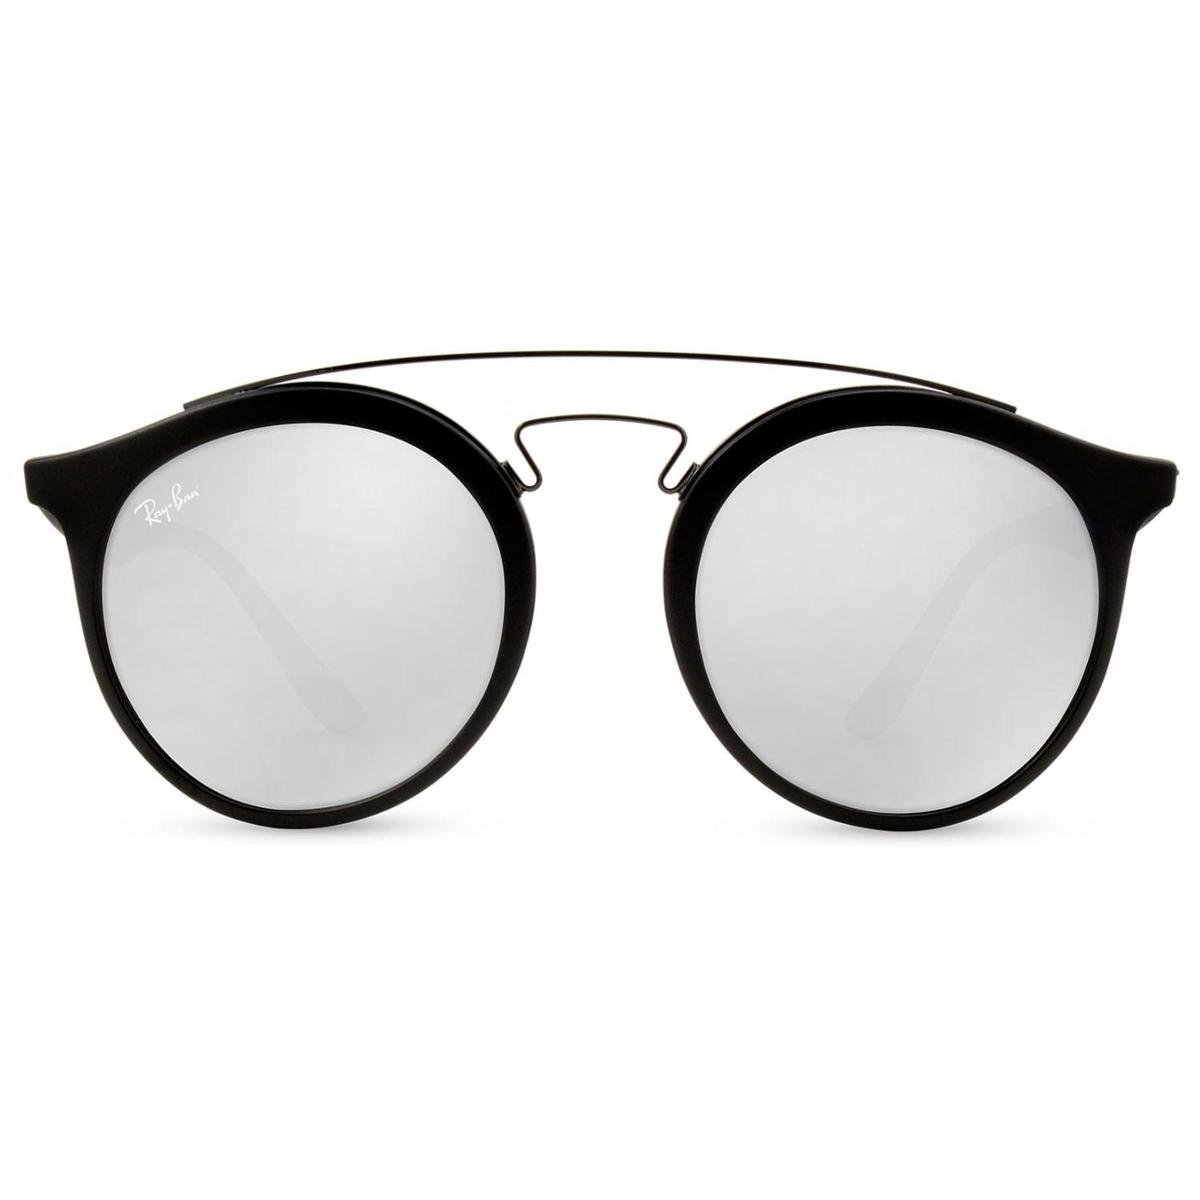 df1bf287a8da3 Óculos Ray Ban New Gatsby Round RB4256 6253B8-49 - Compre Agora   Zattini